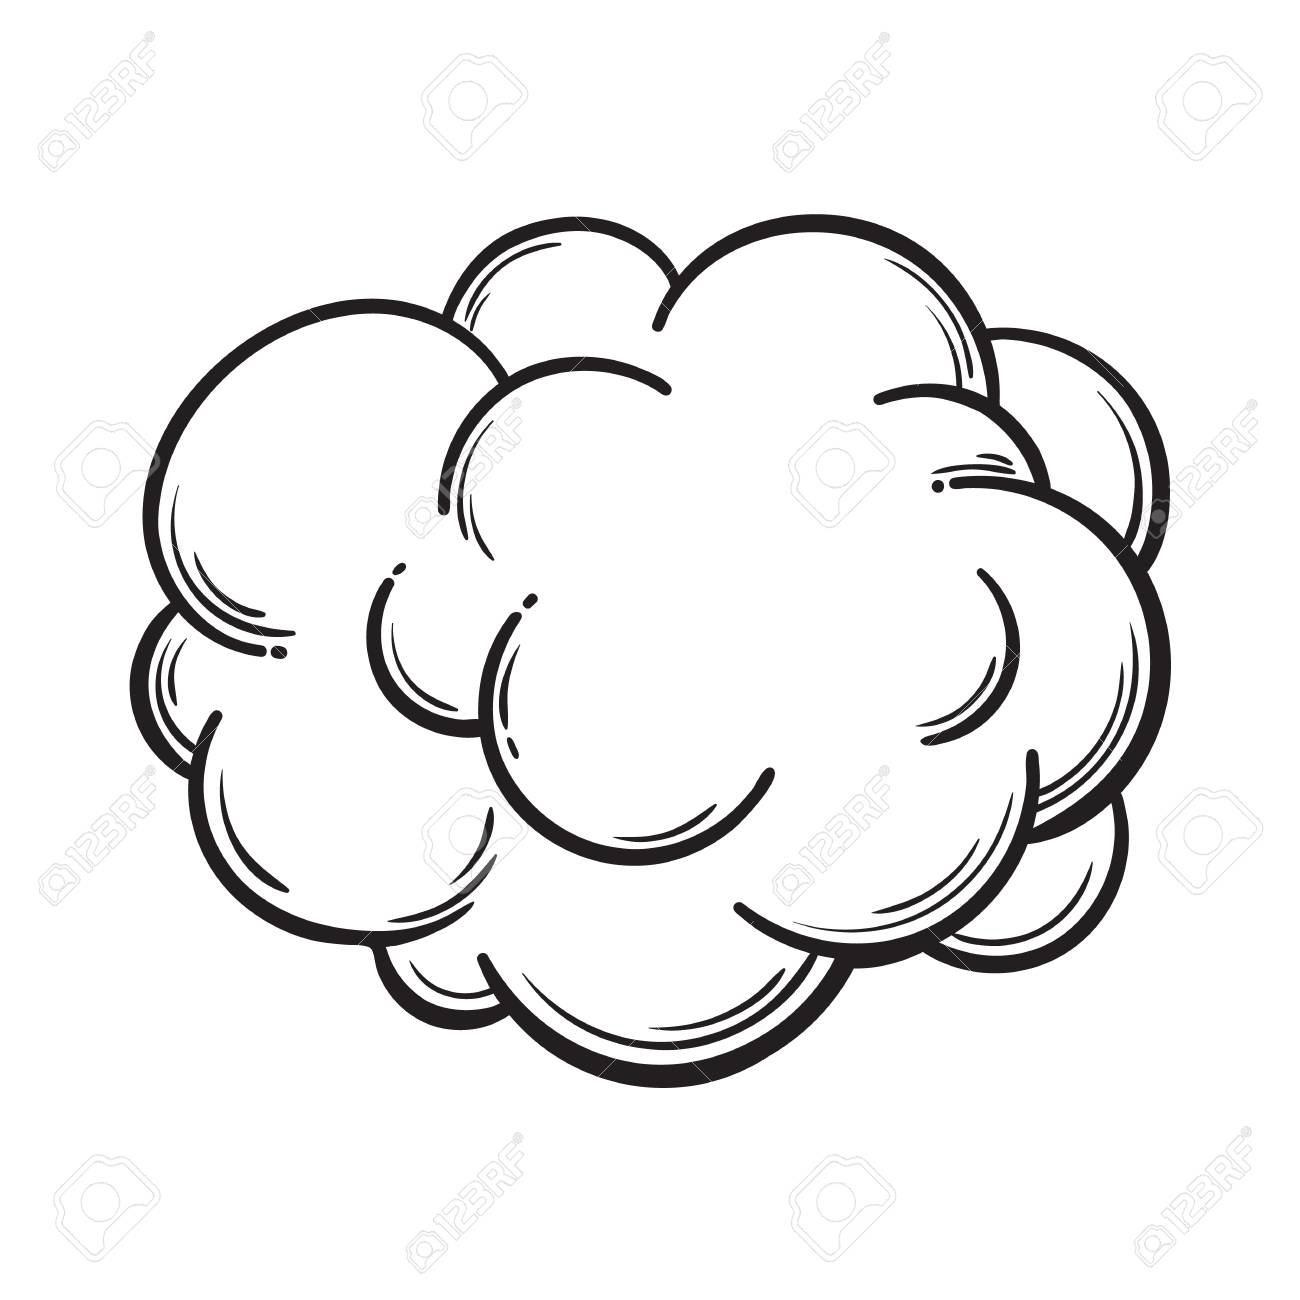 1300x1300 Hand Drawn Fog, Smoke Cloud, Black And White Comic Style Sketch